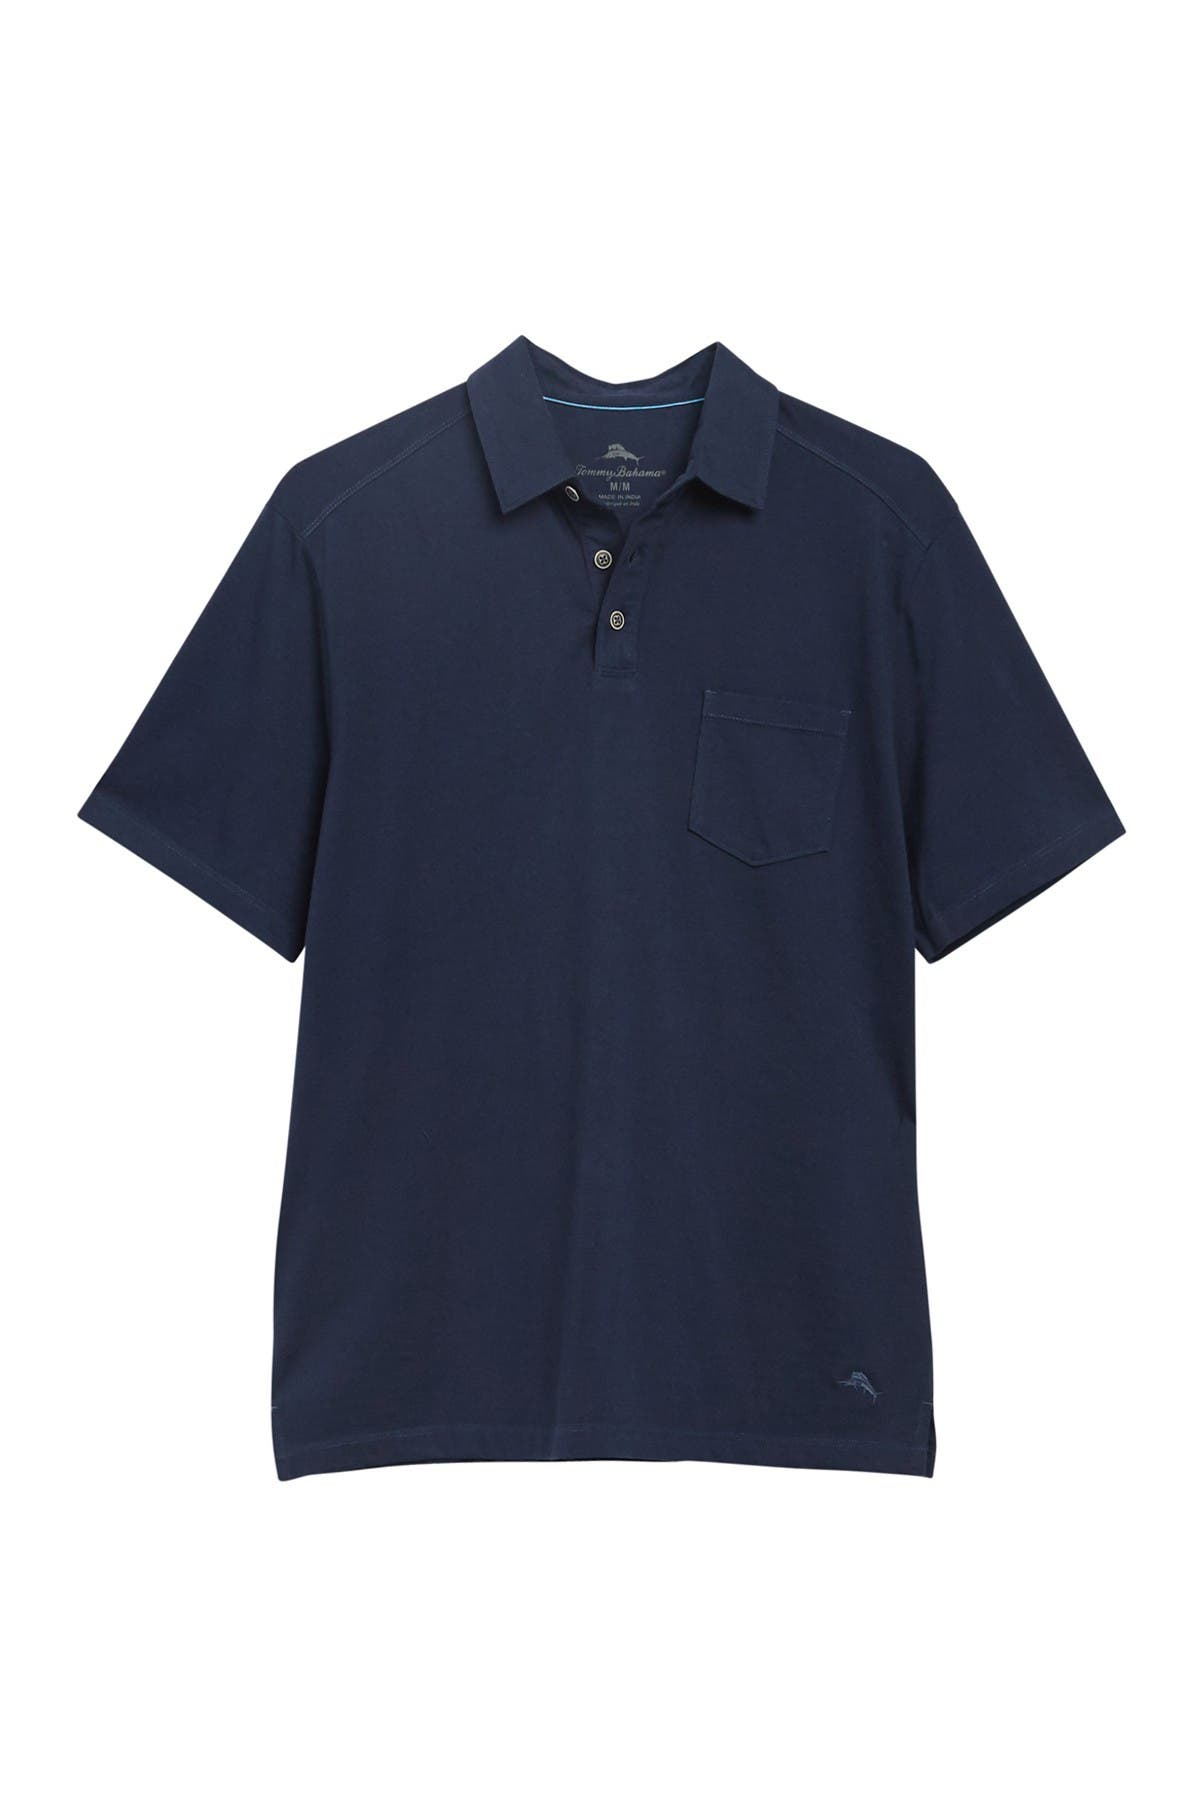 Image of Tommy Bahama Gulf Breeze Pocket Polo